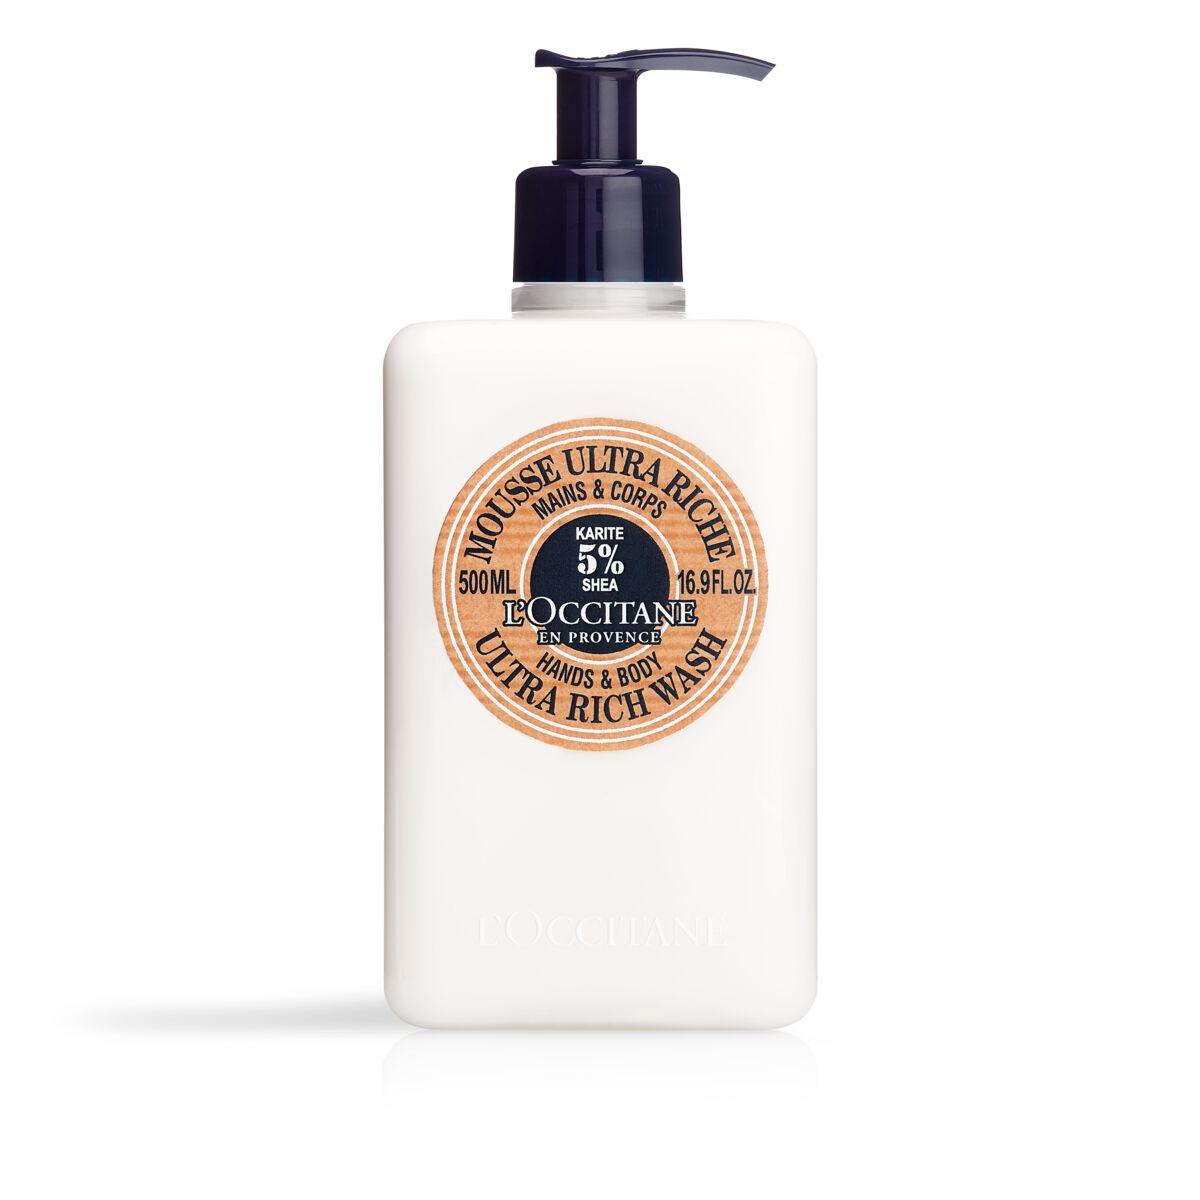 Shea Hands & Body Ultra Rich Wash 16.9 fl. oz.